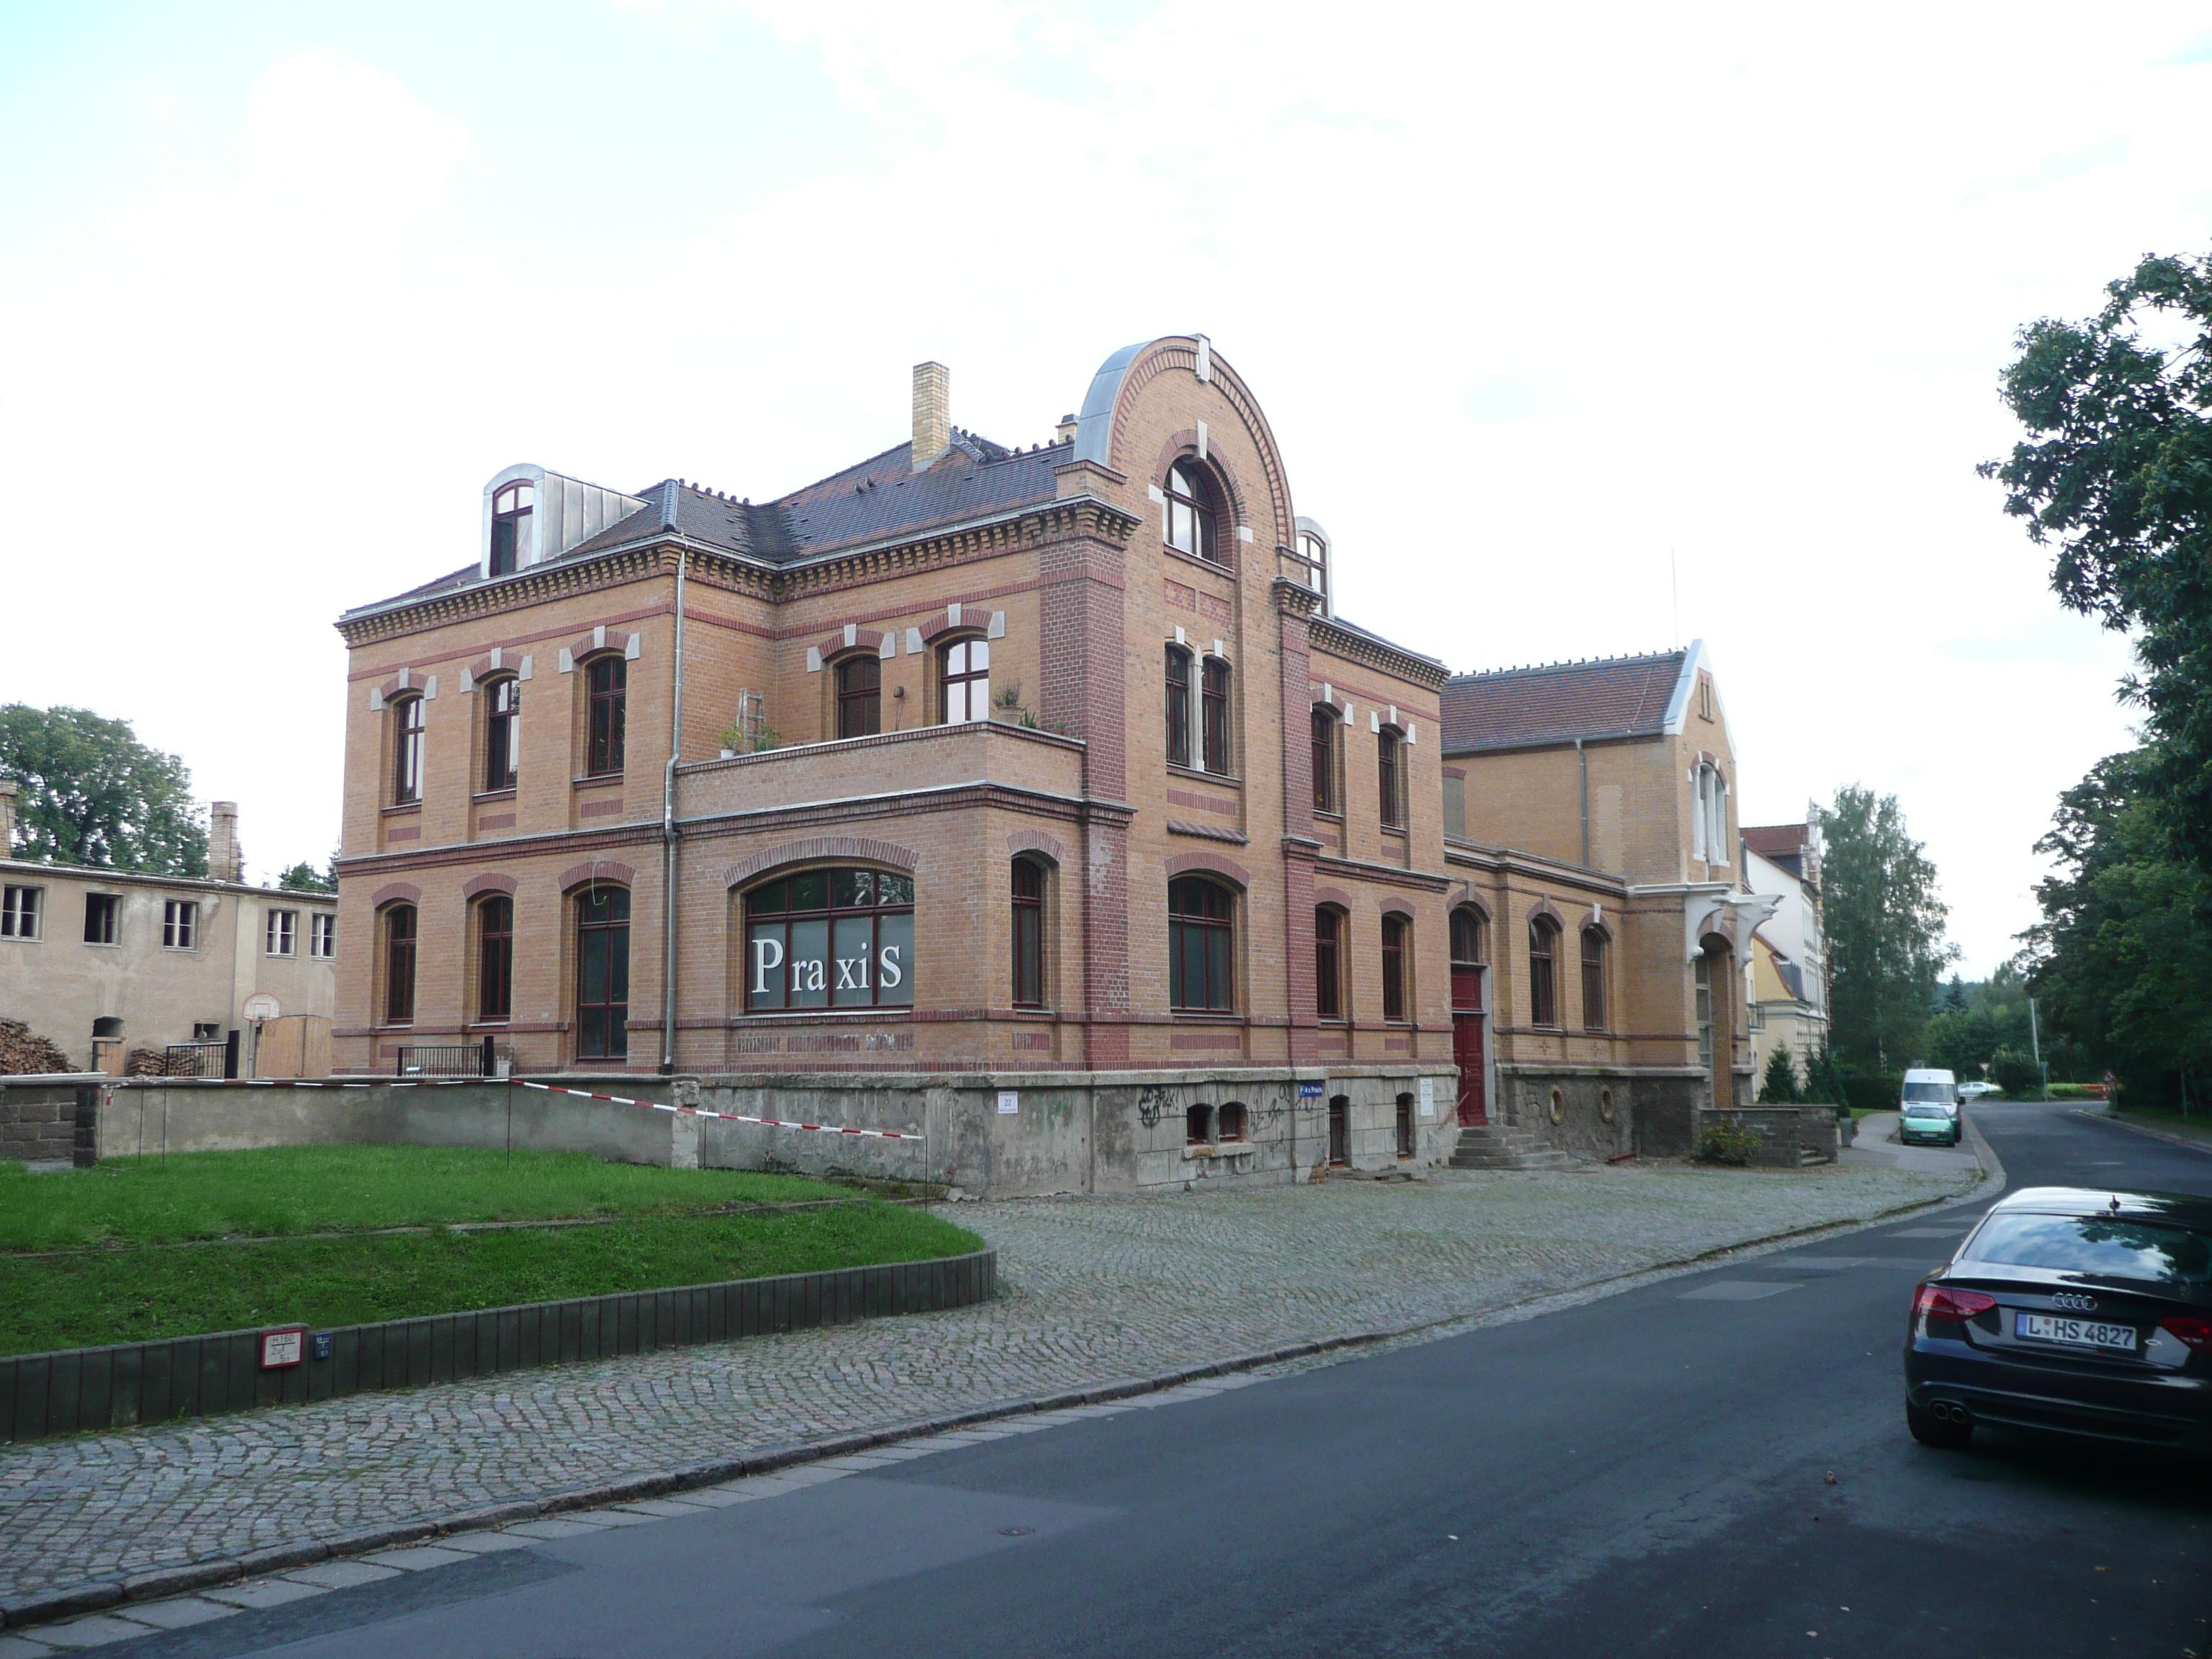 parkschloesschen-brandis.de